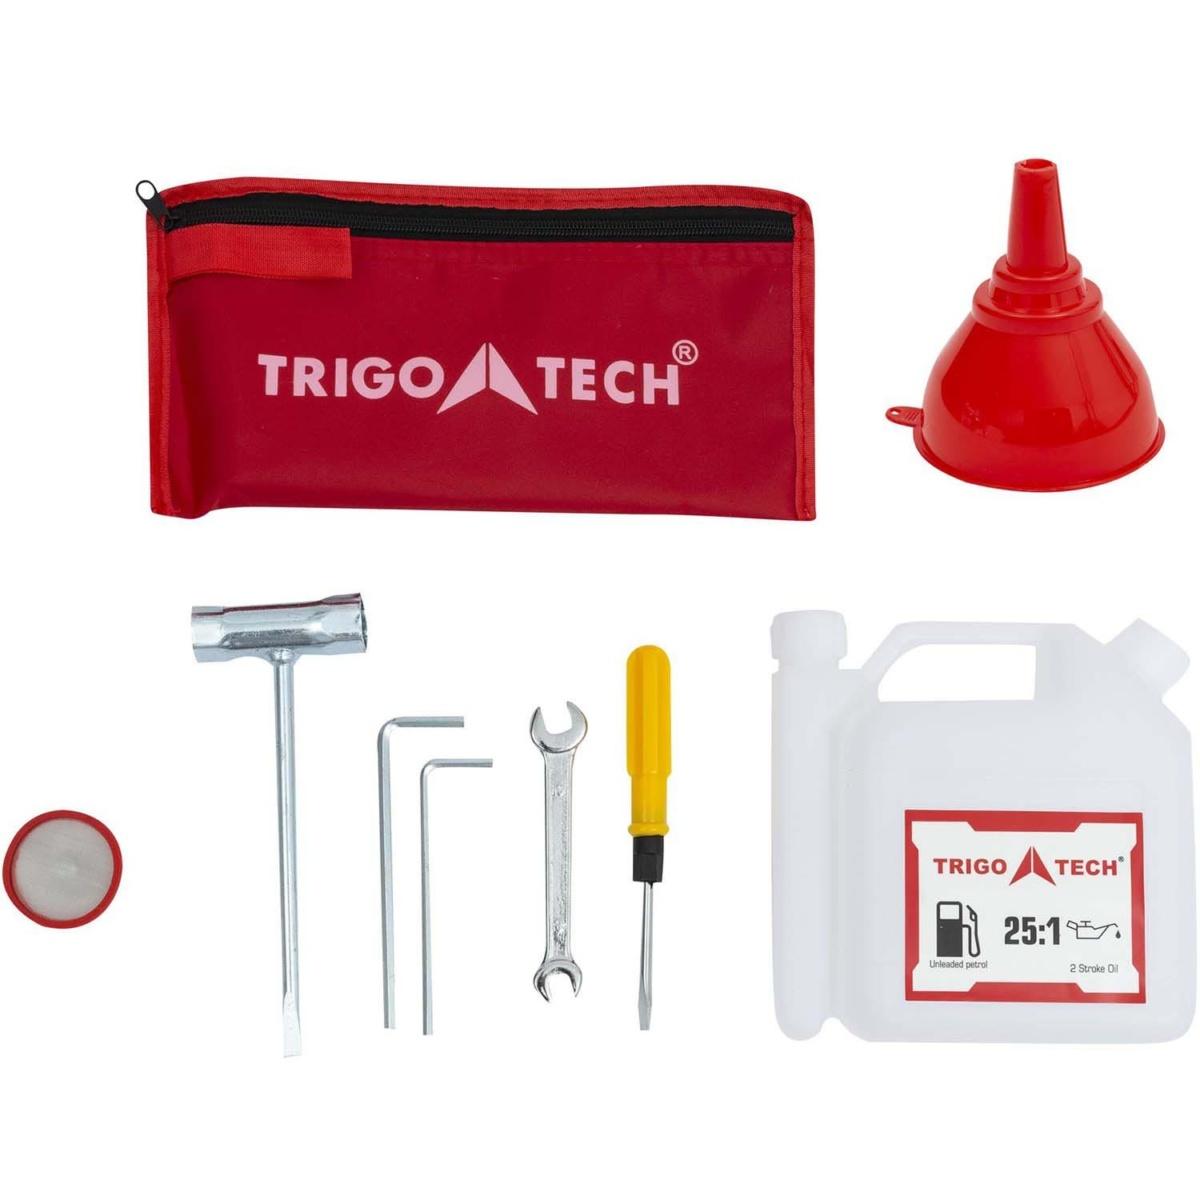 Motoburghiu Trigo Tech 1.5 KW,2.5 CP,51.7 CC,Foreza Pamant, Teox.ro (6)